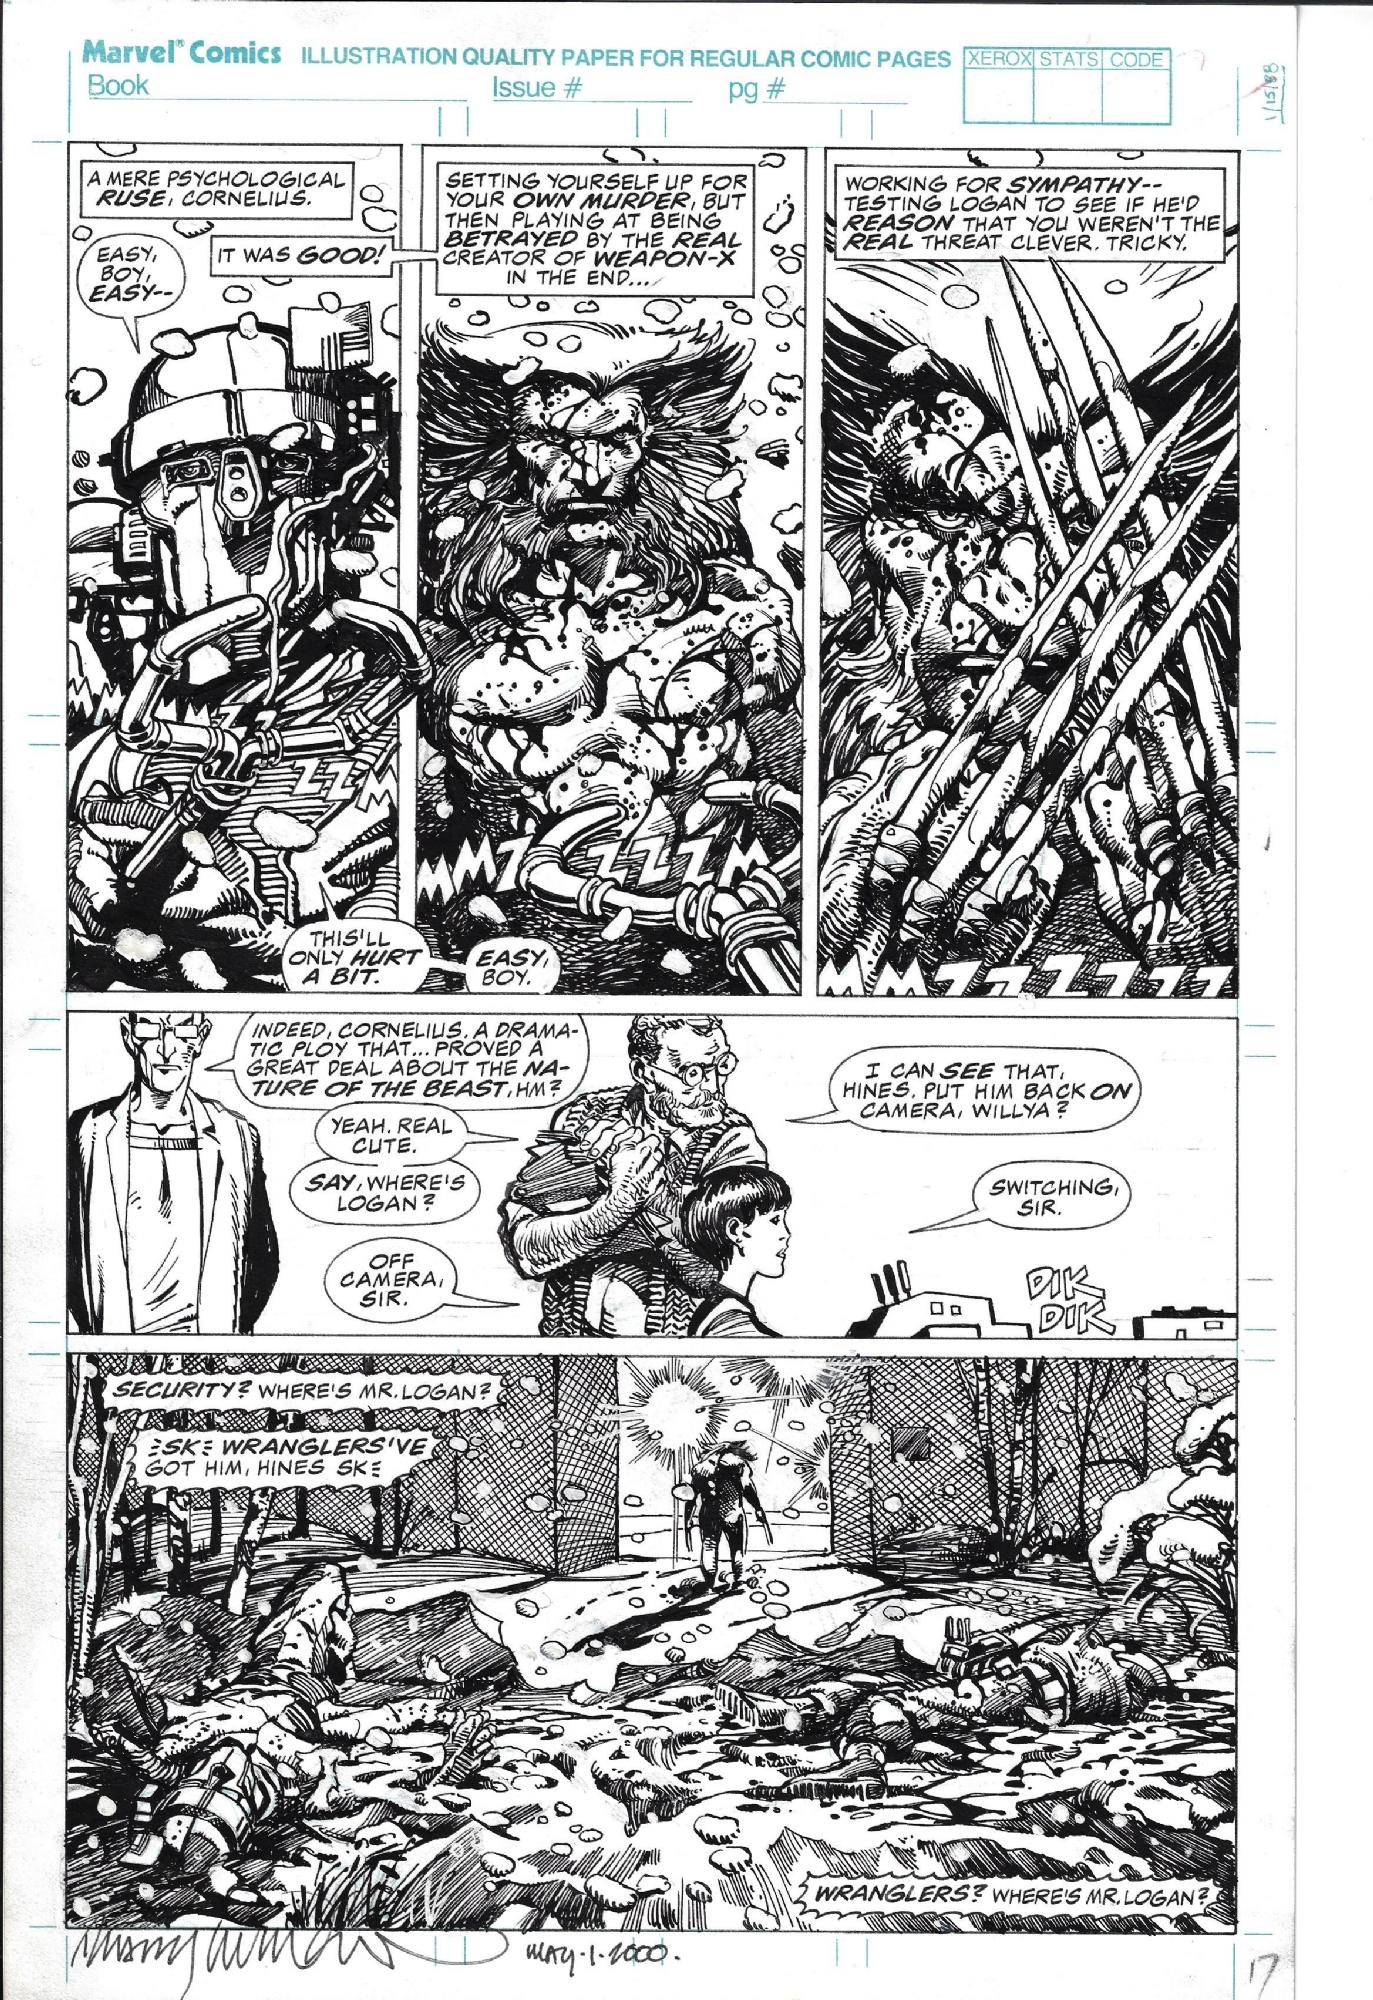 Marvel Comics Presents 84 page 17, in robert frey's Barry Windsor